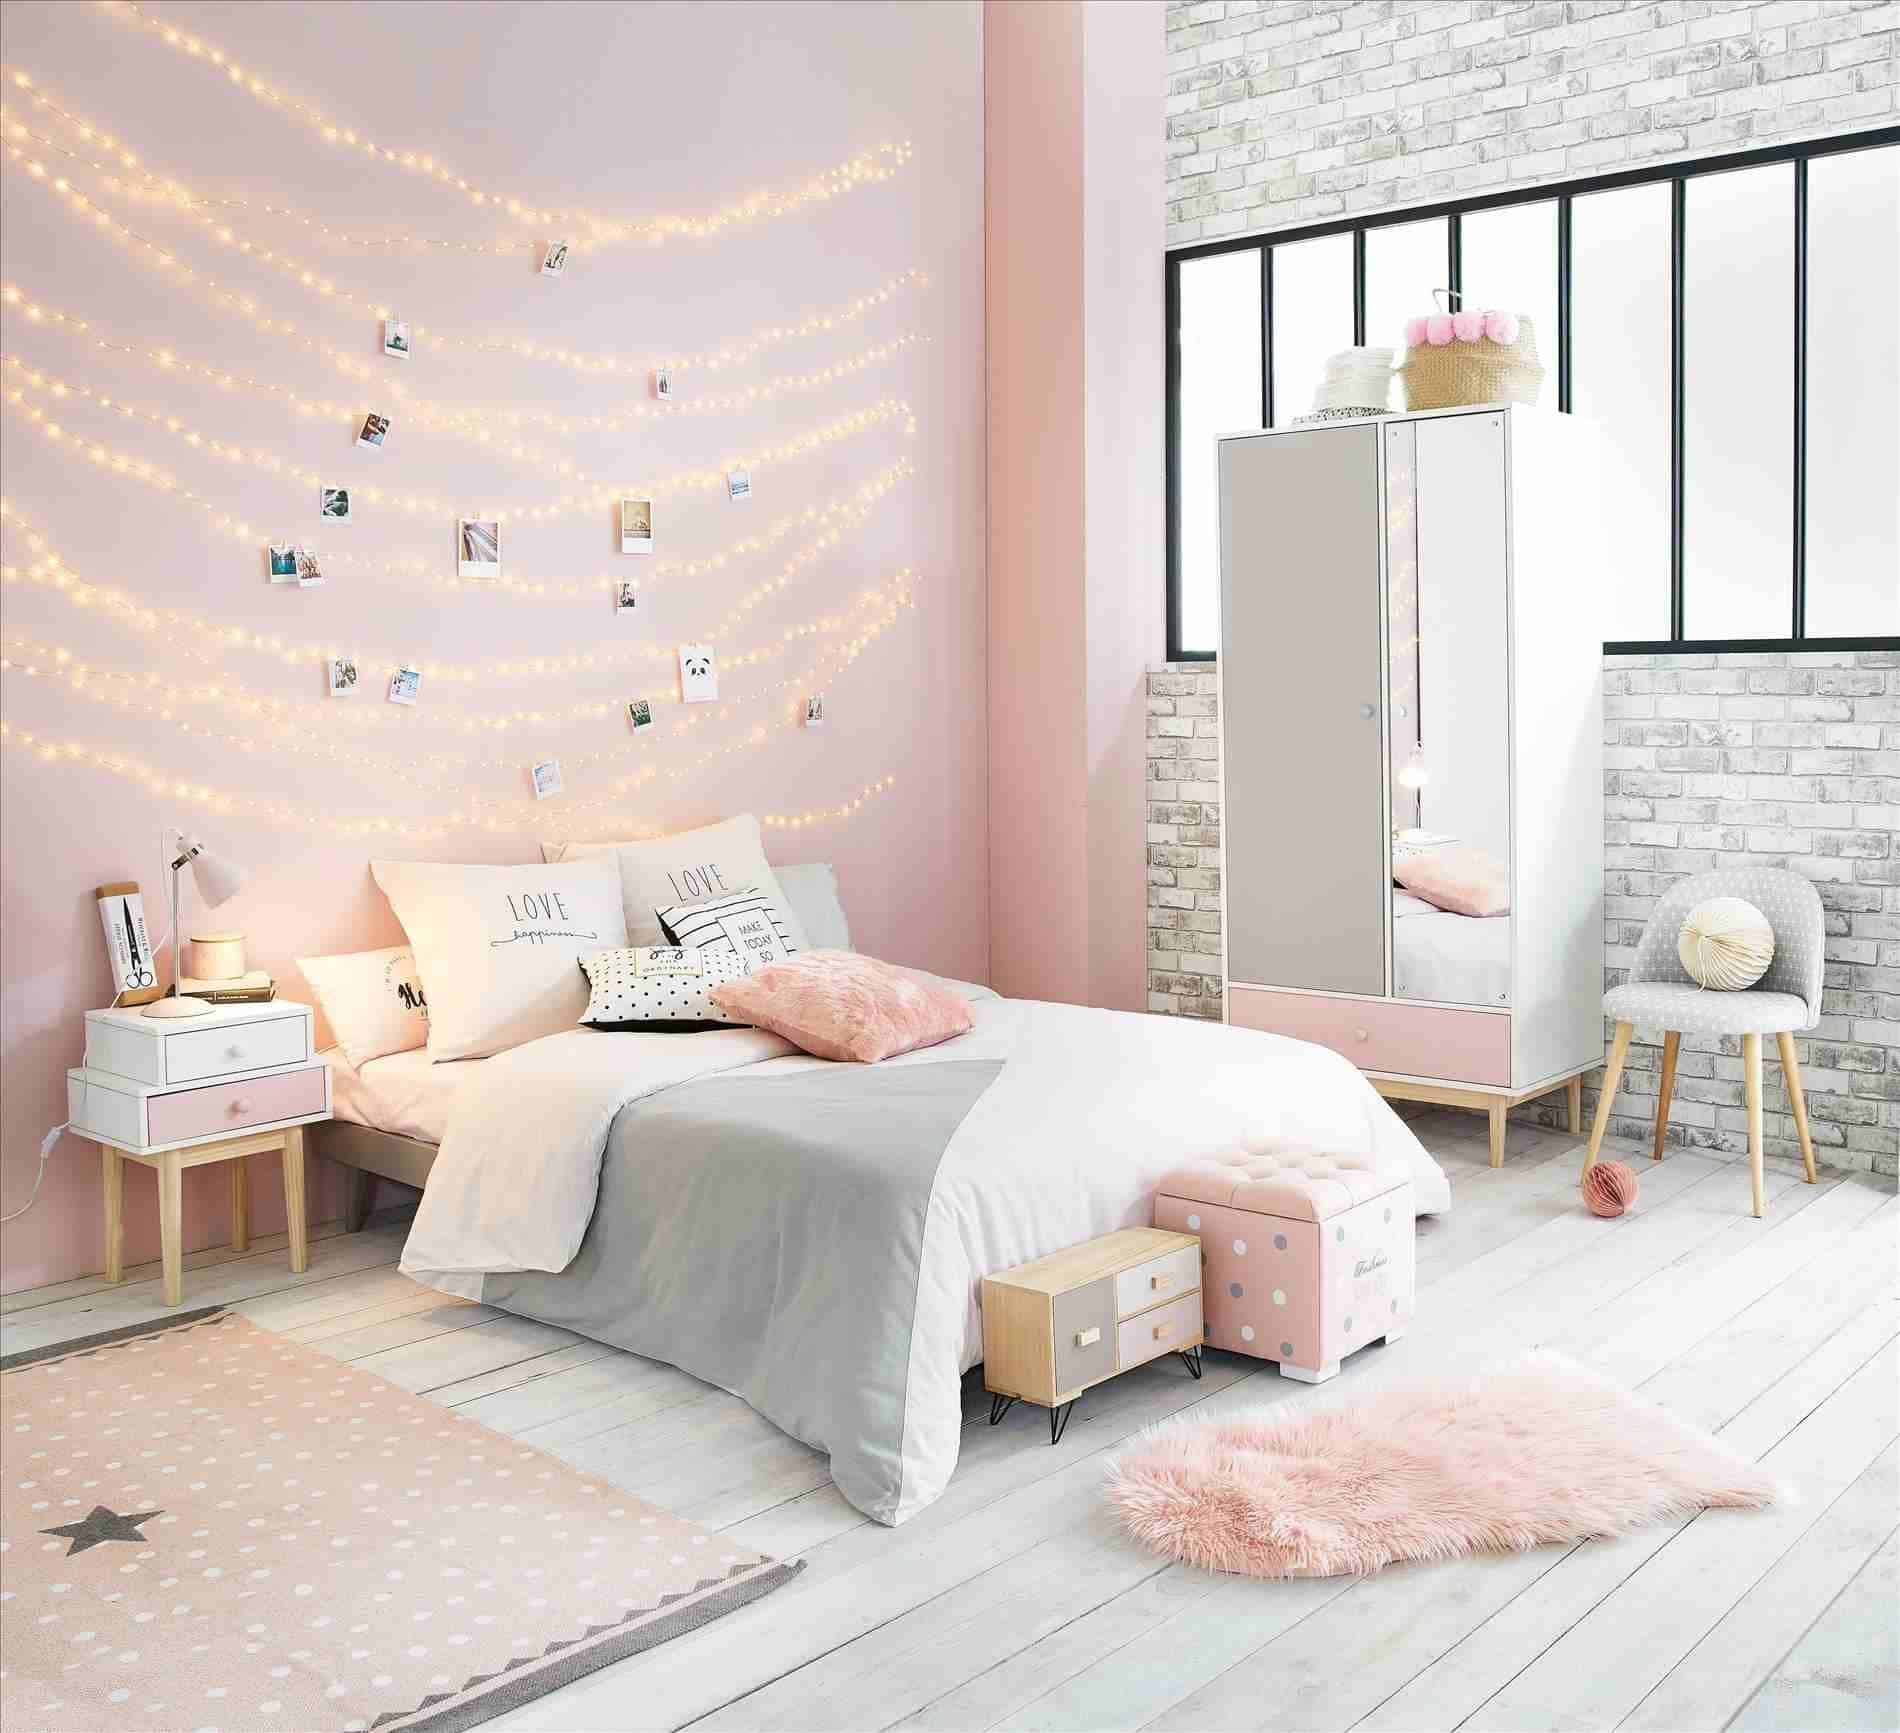 Crazy Cool Kids Bedroom Ideas on Room Girl  id=69481